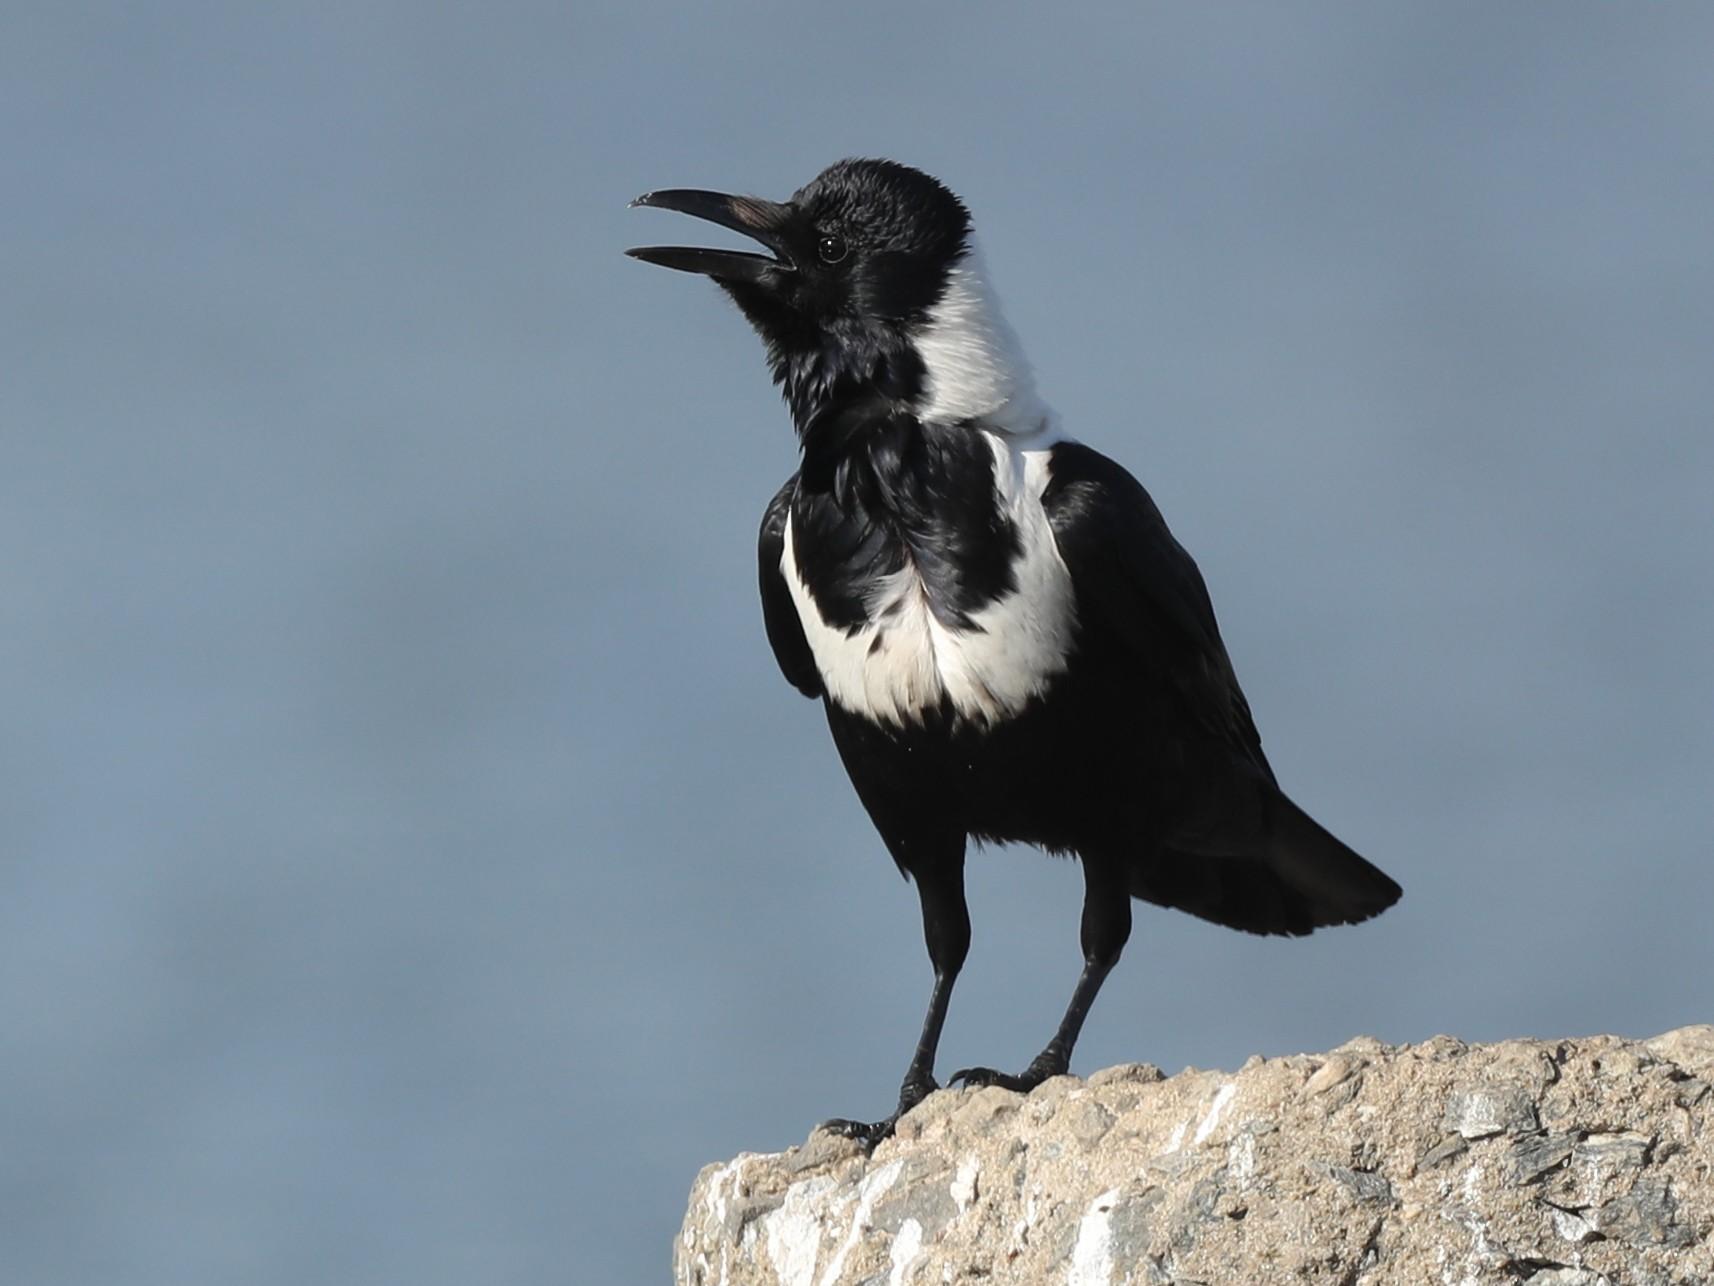 Collared Crow - Ting-Wei (廷維) HUNG (洪)